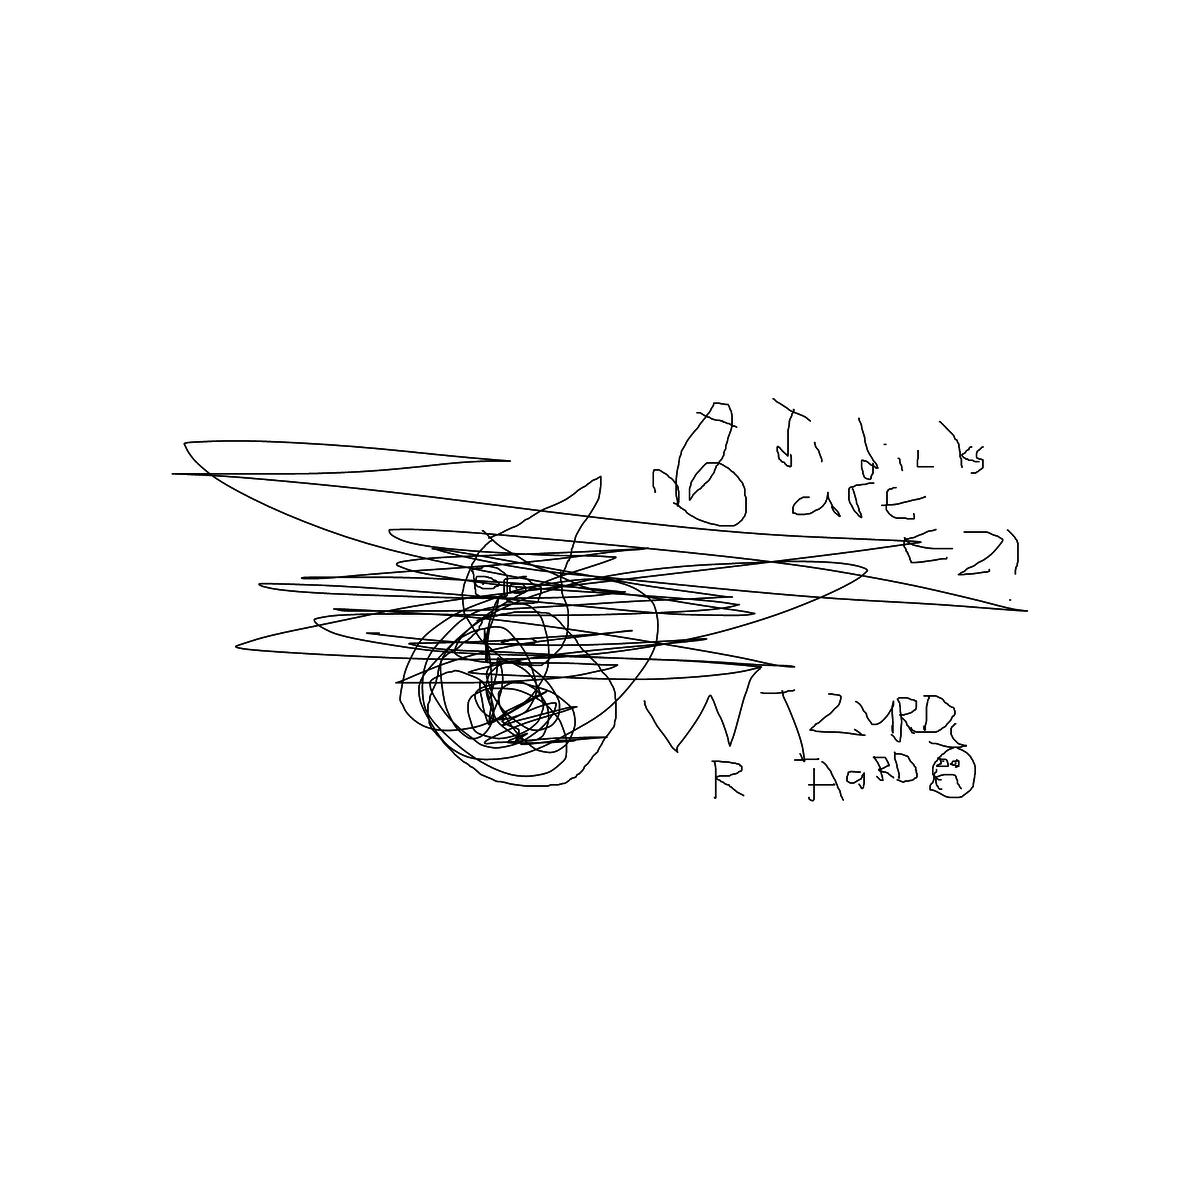 BAAAM drawing#18156 lat:53.9561195373535160lng: -2.8256480693817140